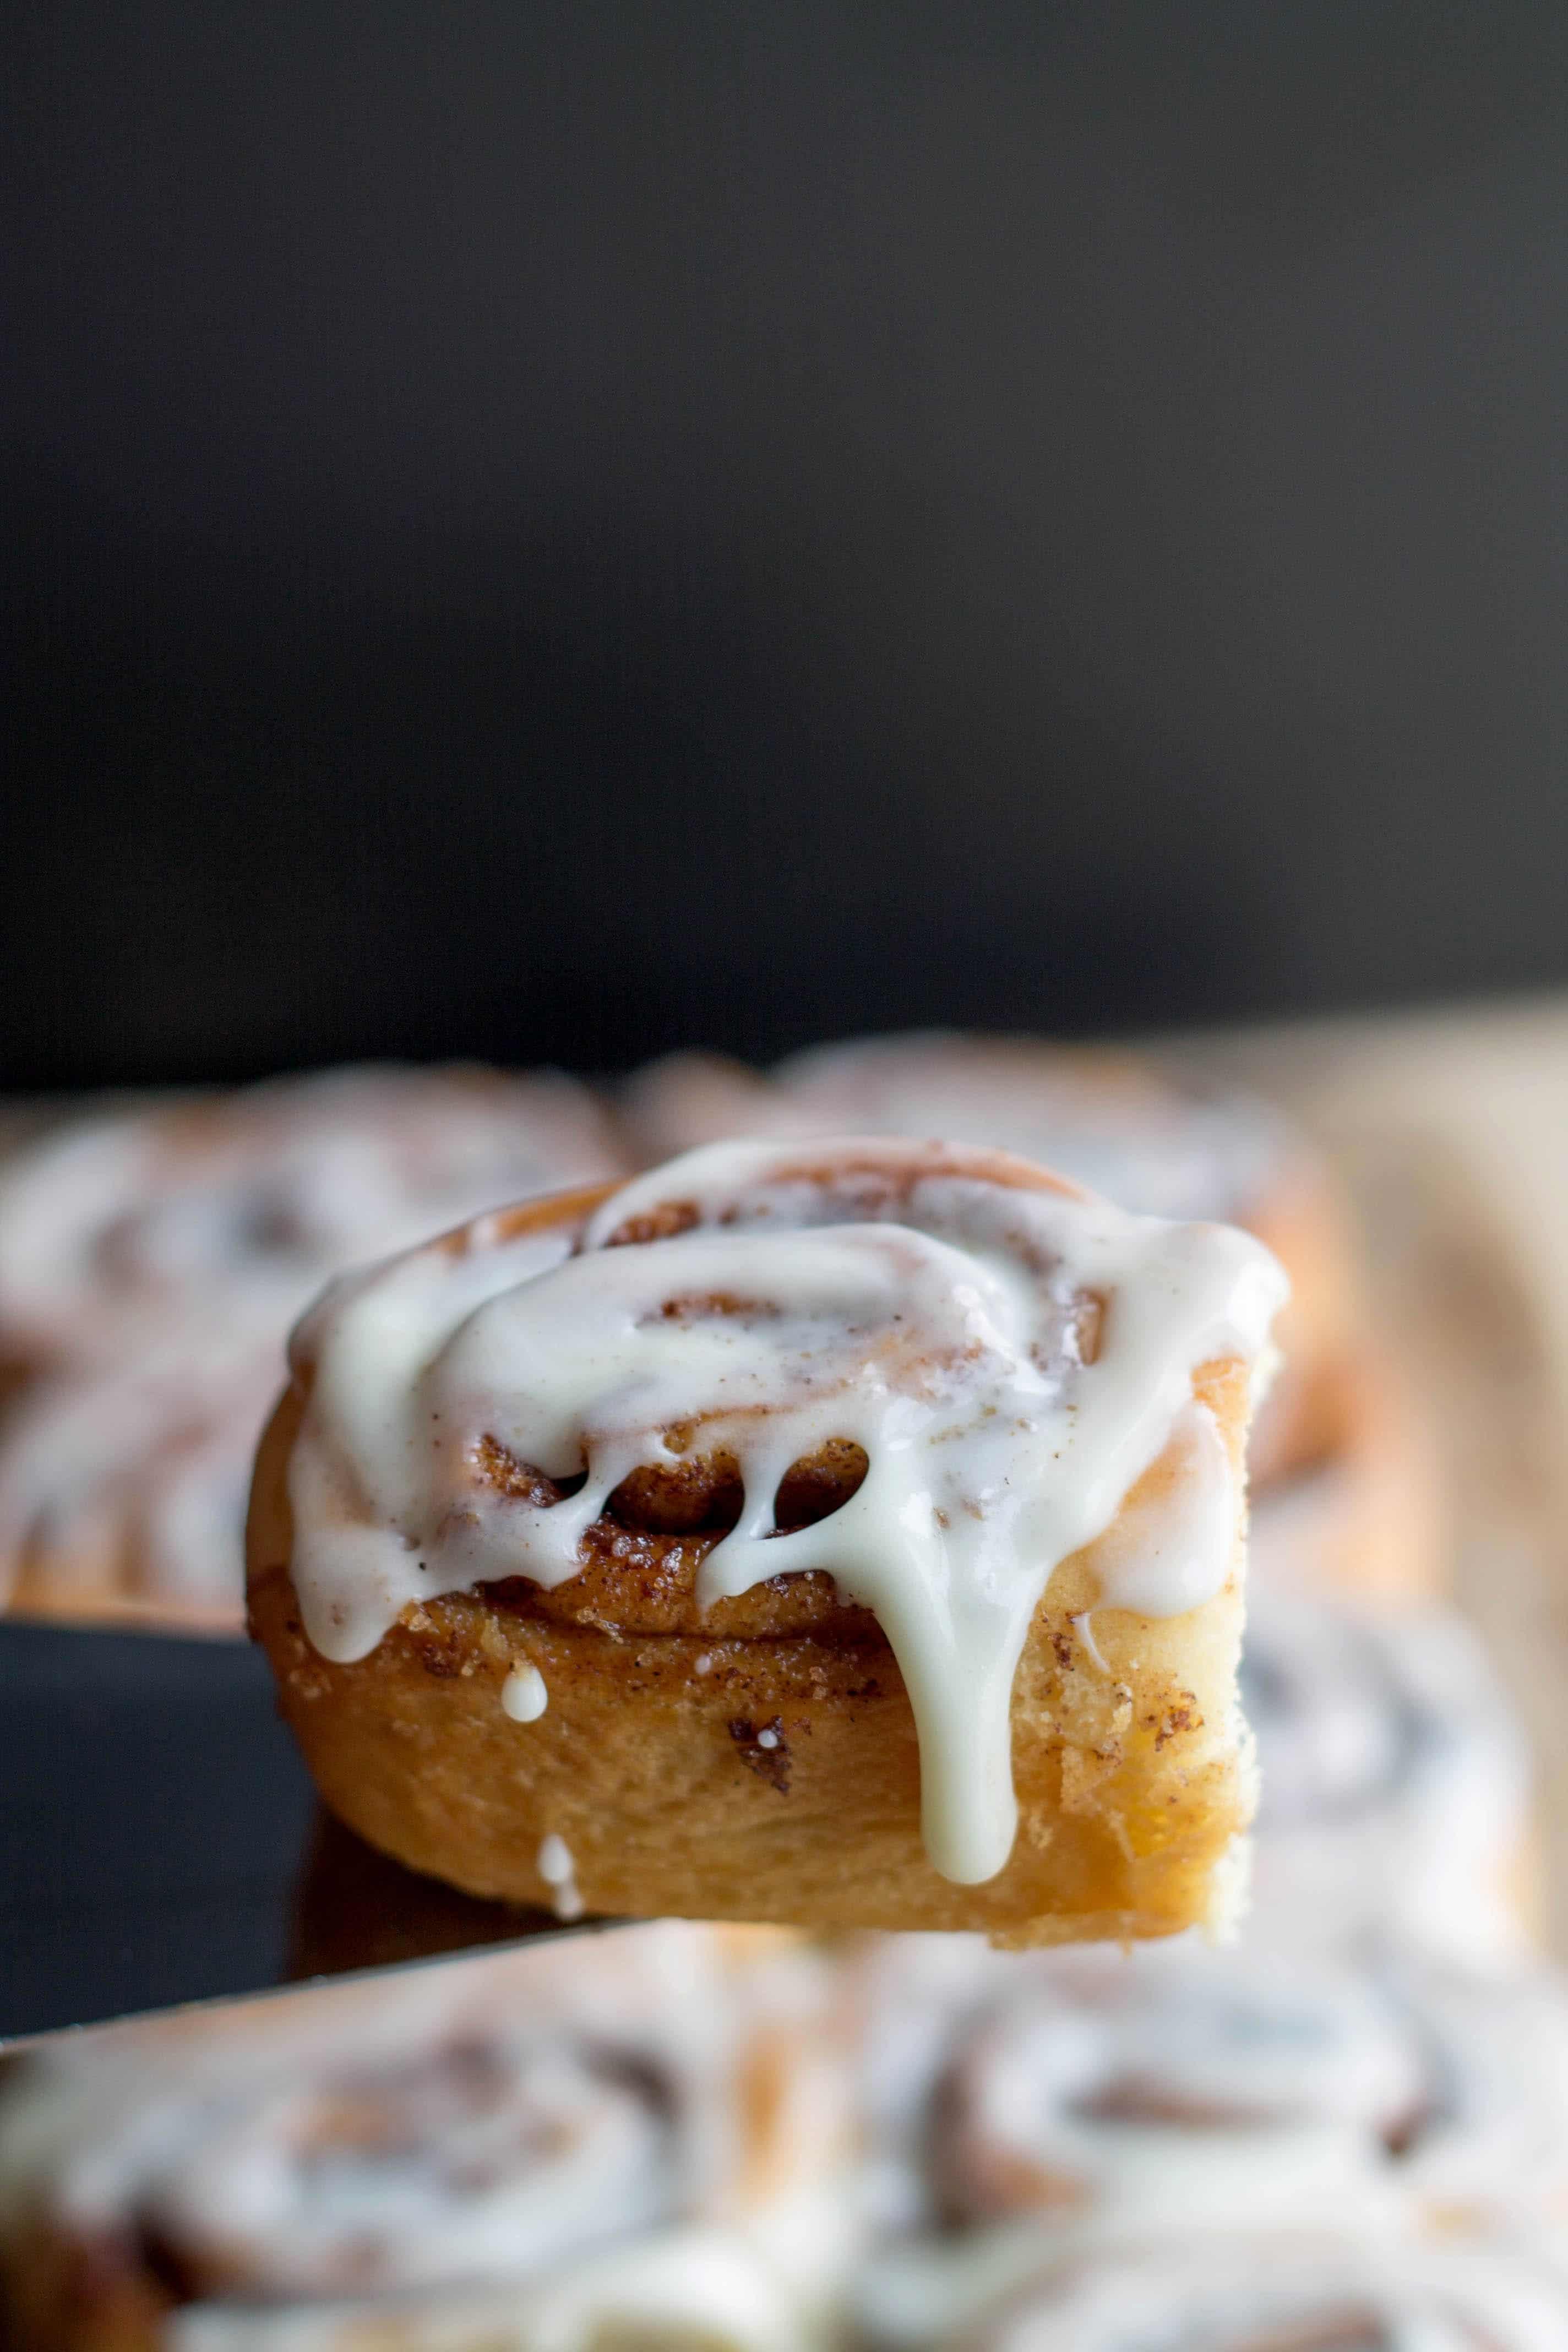 A close up of a cinnamon bun on a cake slice